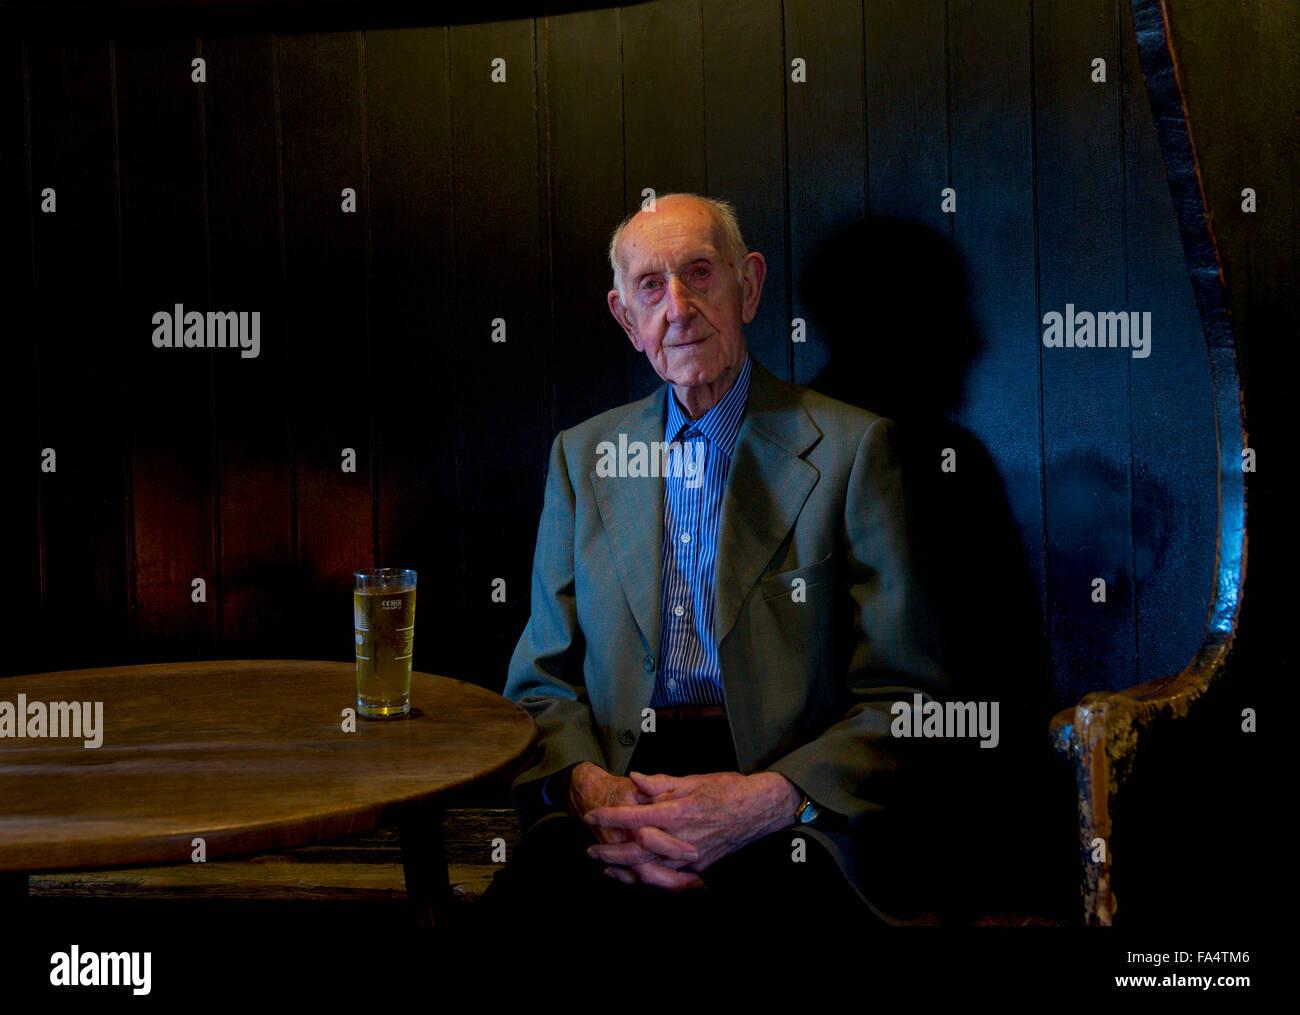 senior-man-sitting-in-the-fleece-inn-bretforton-near-evesham-worcestershire-FA4TM6.jpg